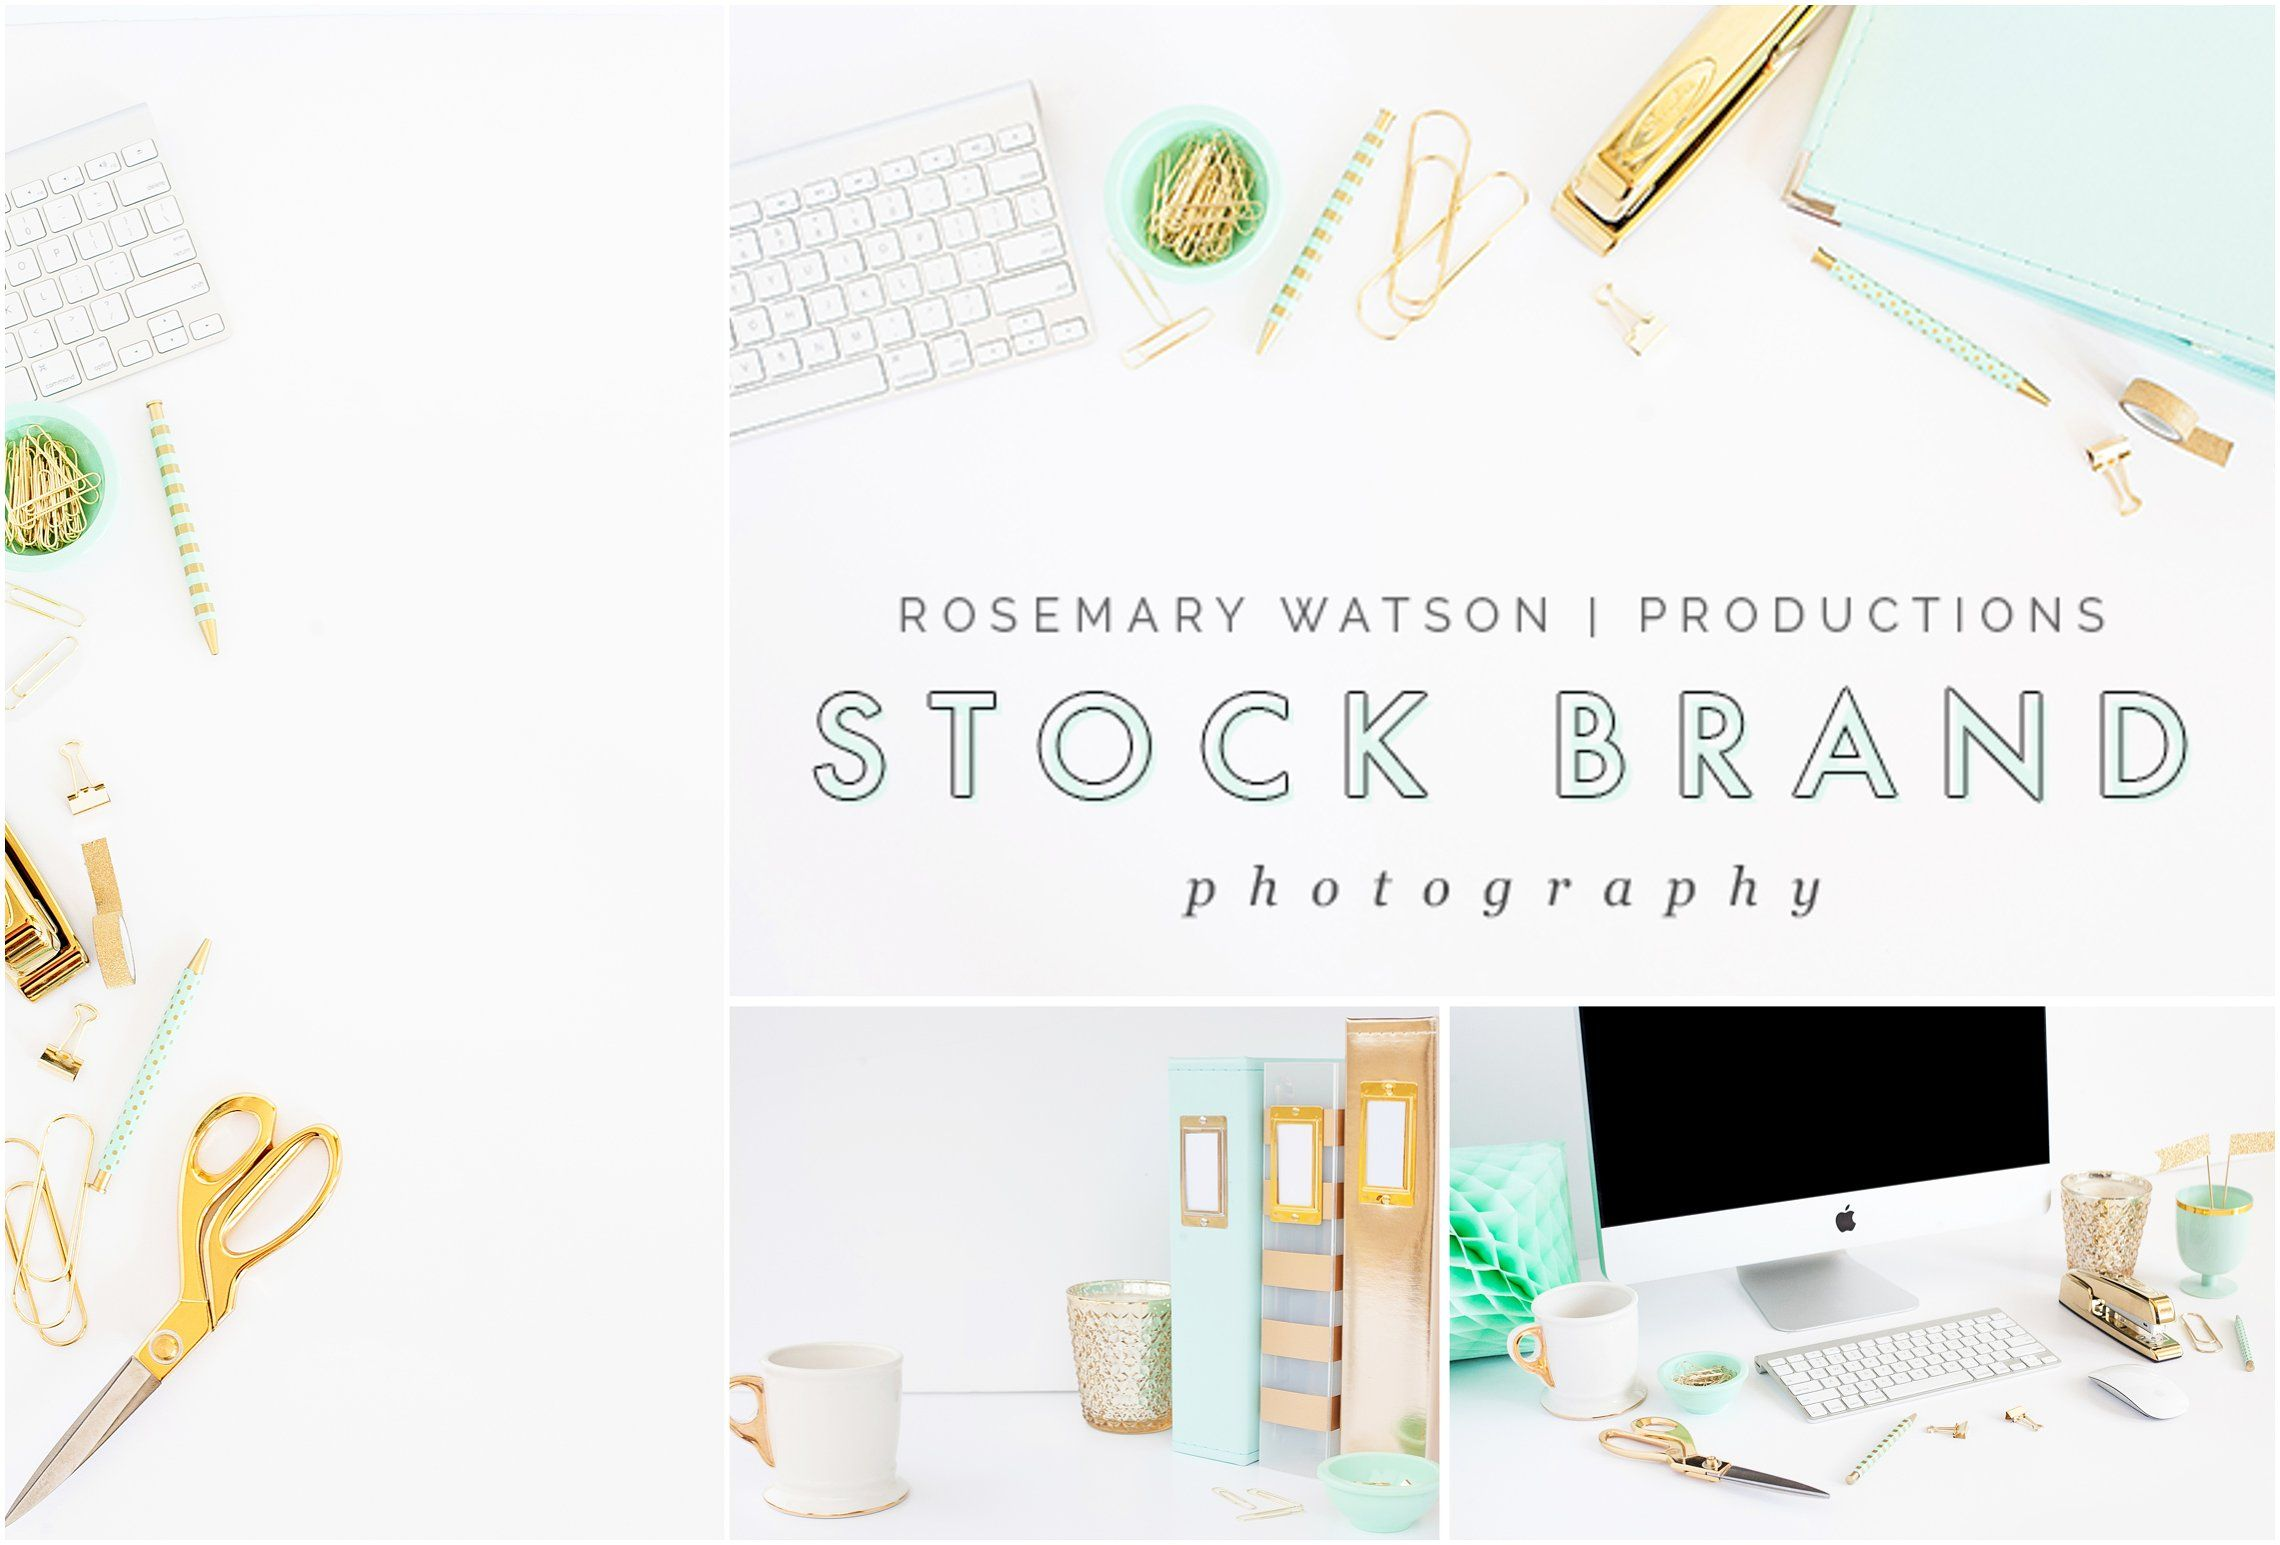 Mint Gold Stock Photo Bundle By Rw Productions On Creativemarket Gold Stock Gold Bullion Bars Creative Branding Design